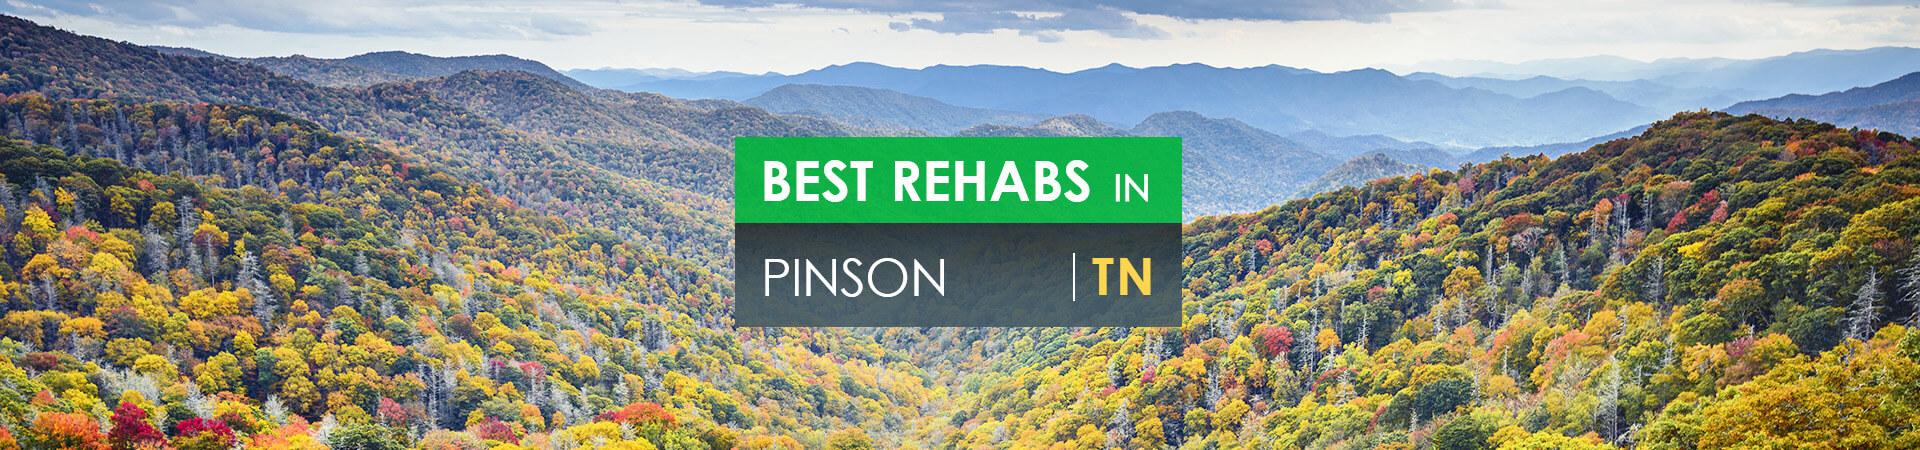 Best rehabs in Pinson, TN